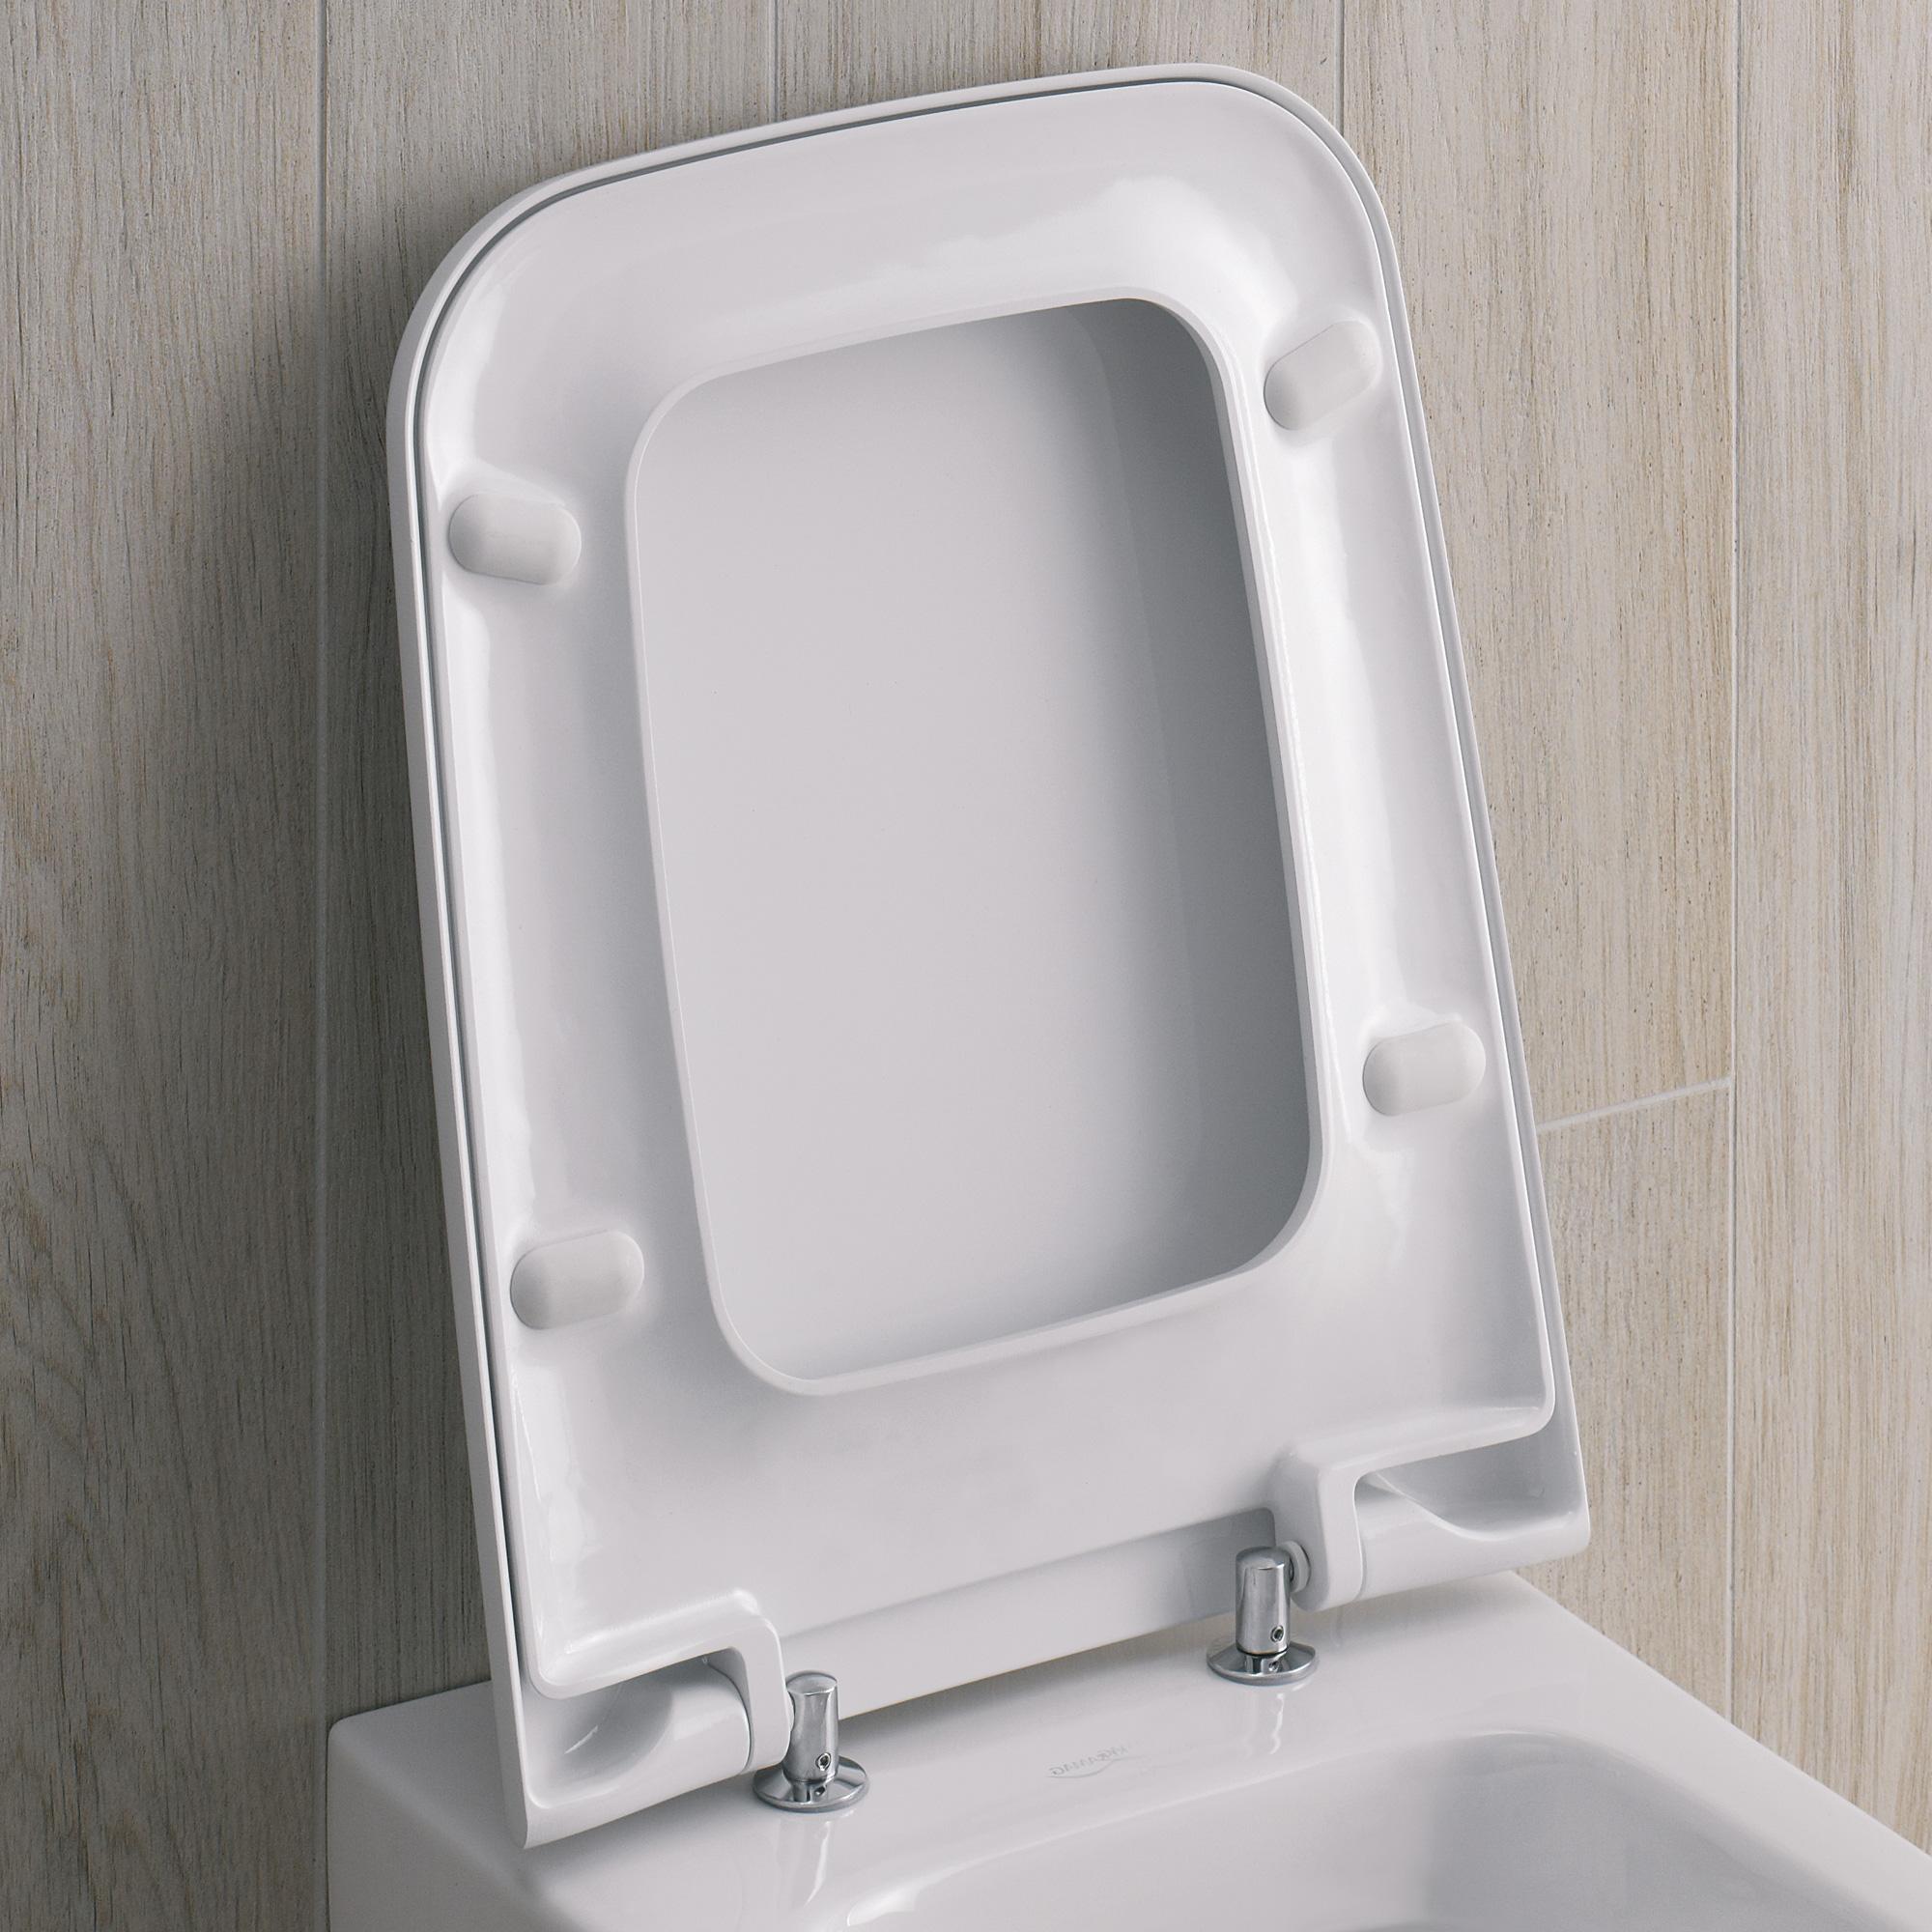 keramag it wc sitz mit absenkautomatik 571910000 reuter onlineshop. Black Bedroom Furniture Sets. Home Design Ideas